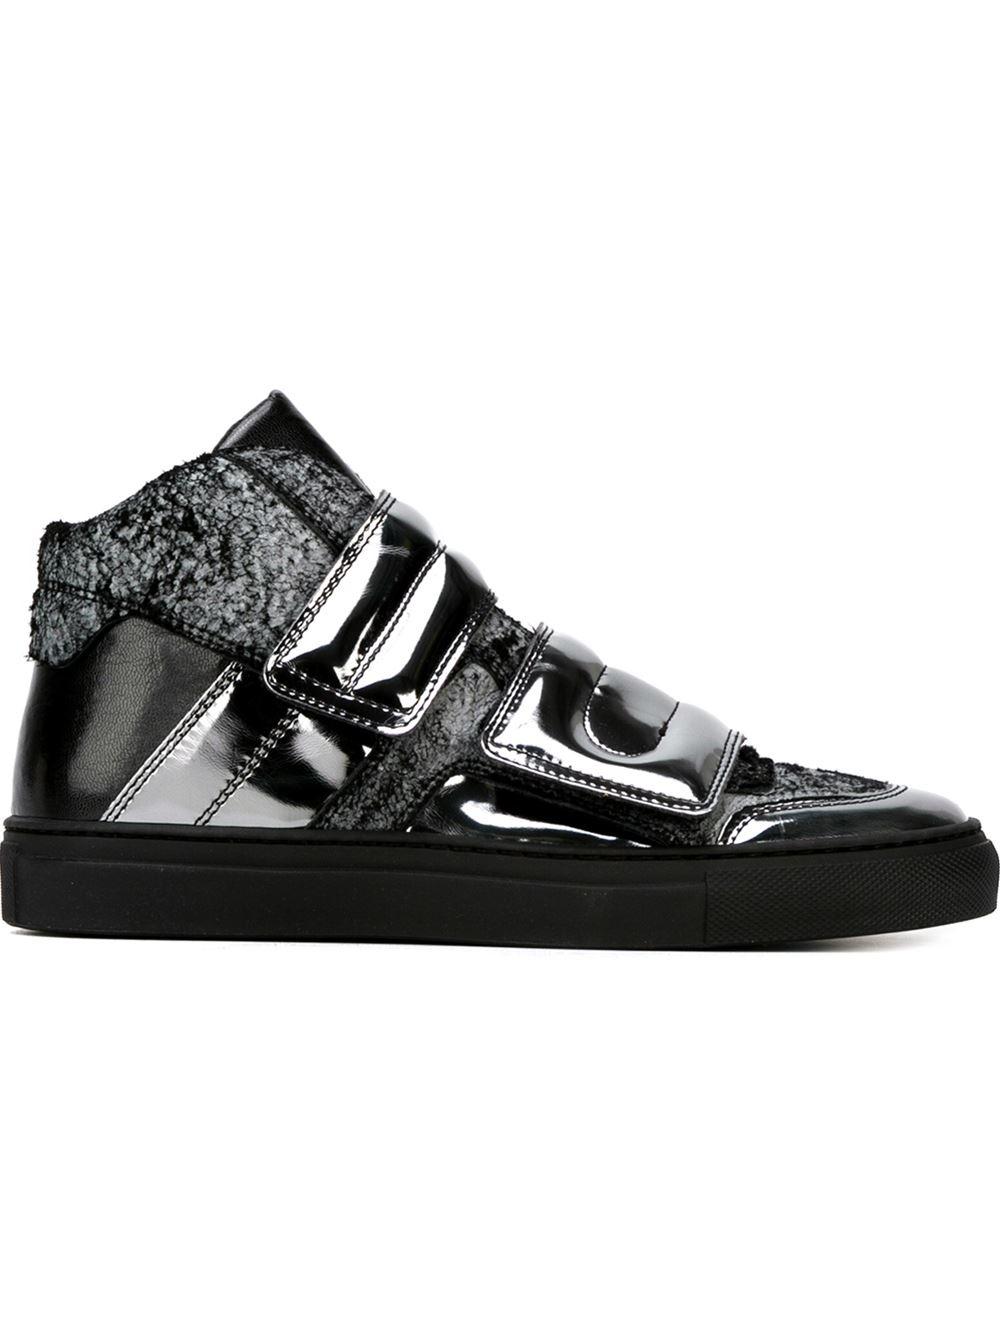 classic hi-top sneakers - Black Maison Martin Margiela 7mreJQLTt